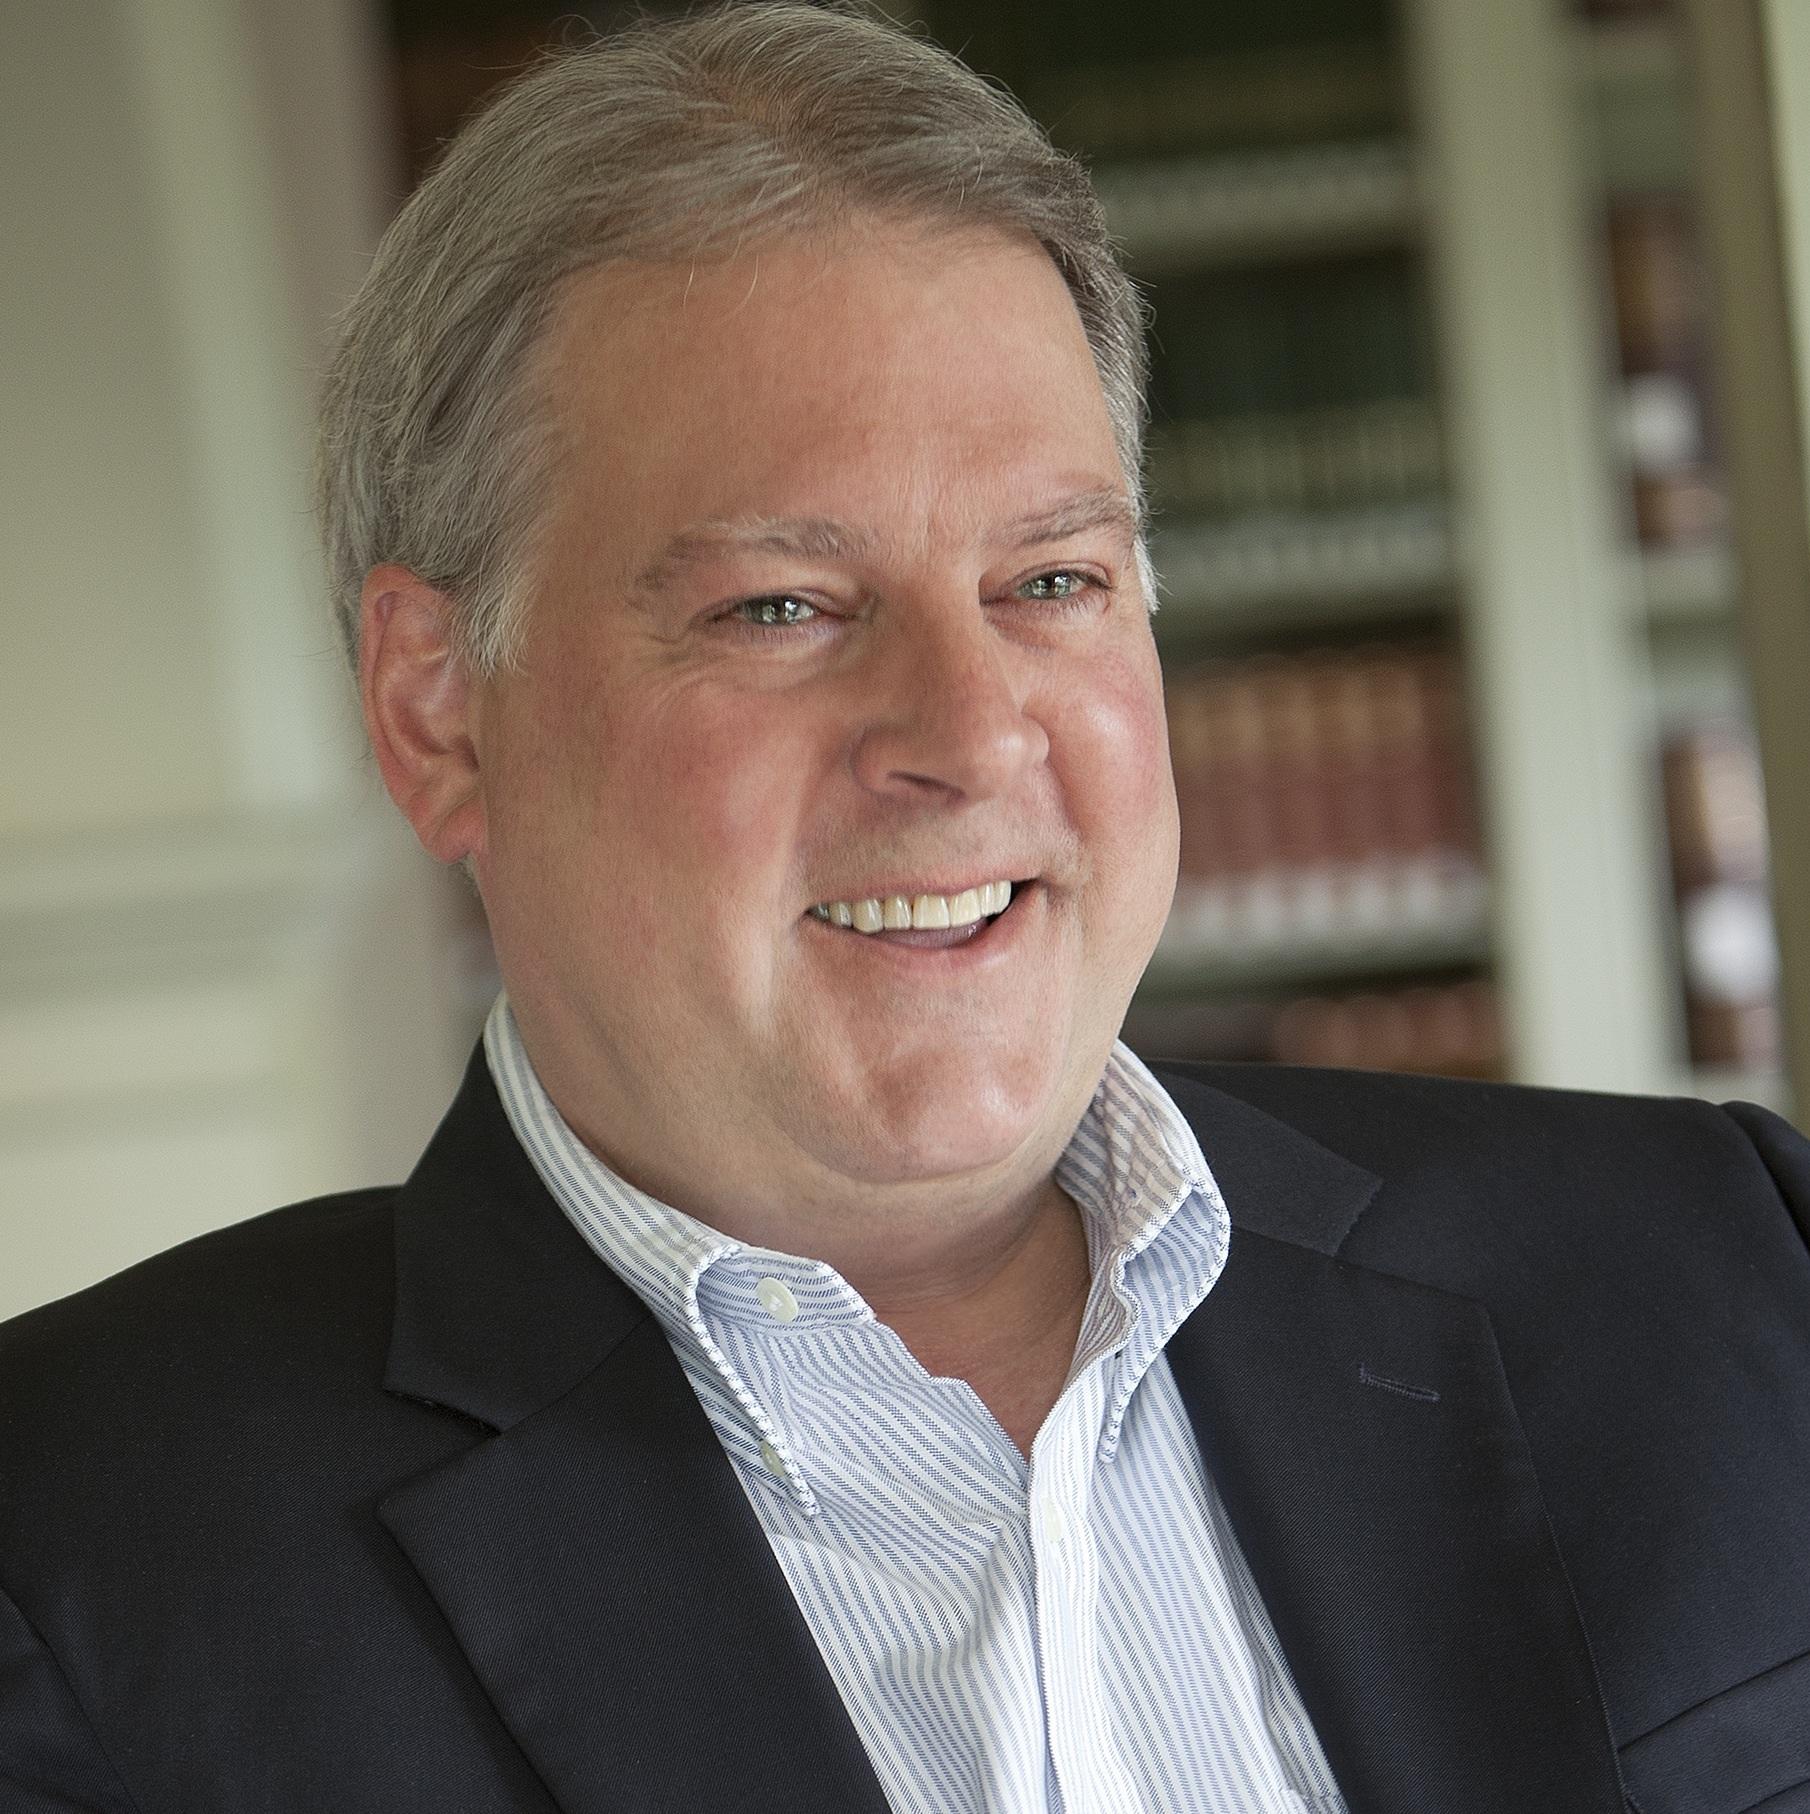 Mark McElory